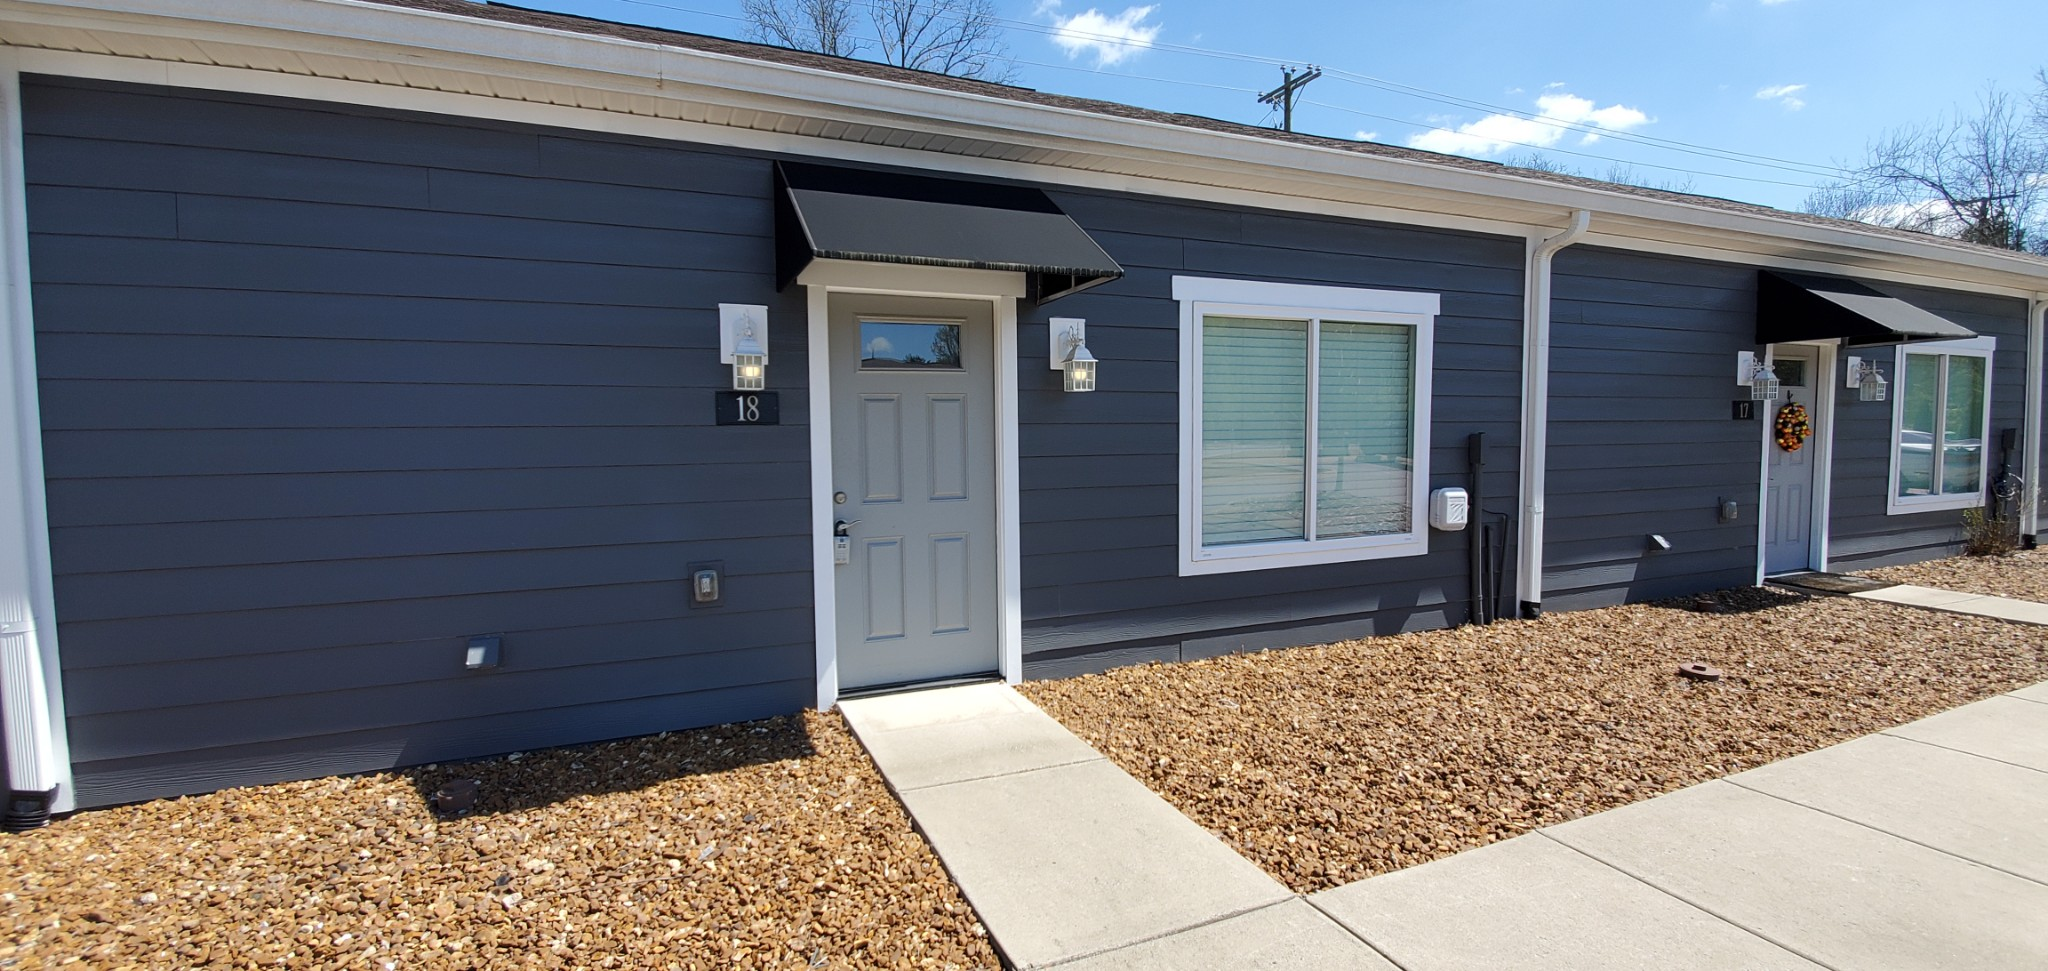 163 Bell Rd #18 Property Photo - Nashville, TN real estate listing